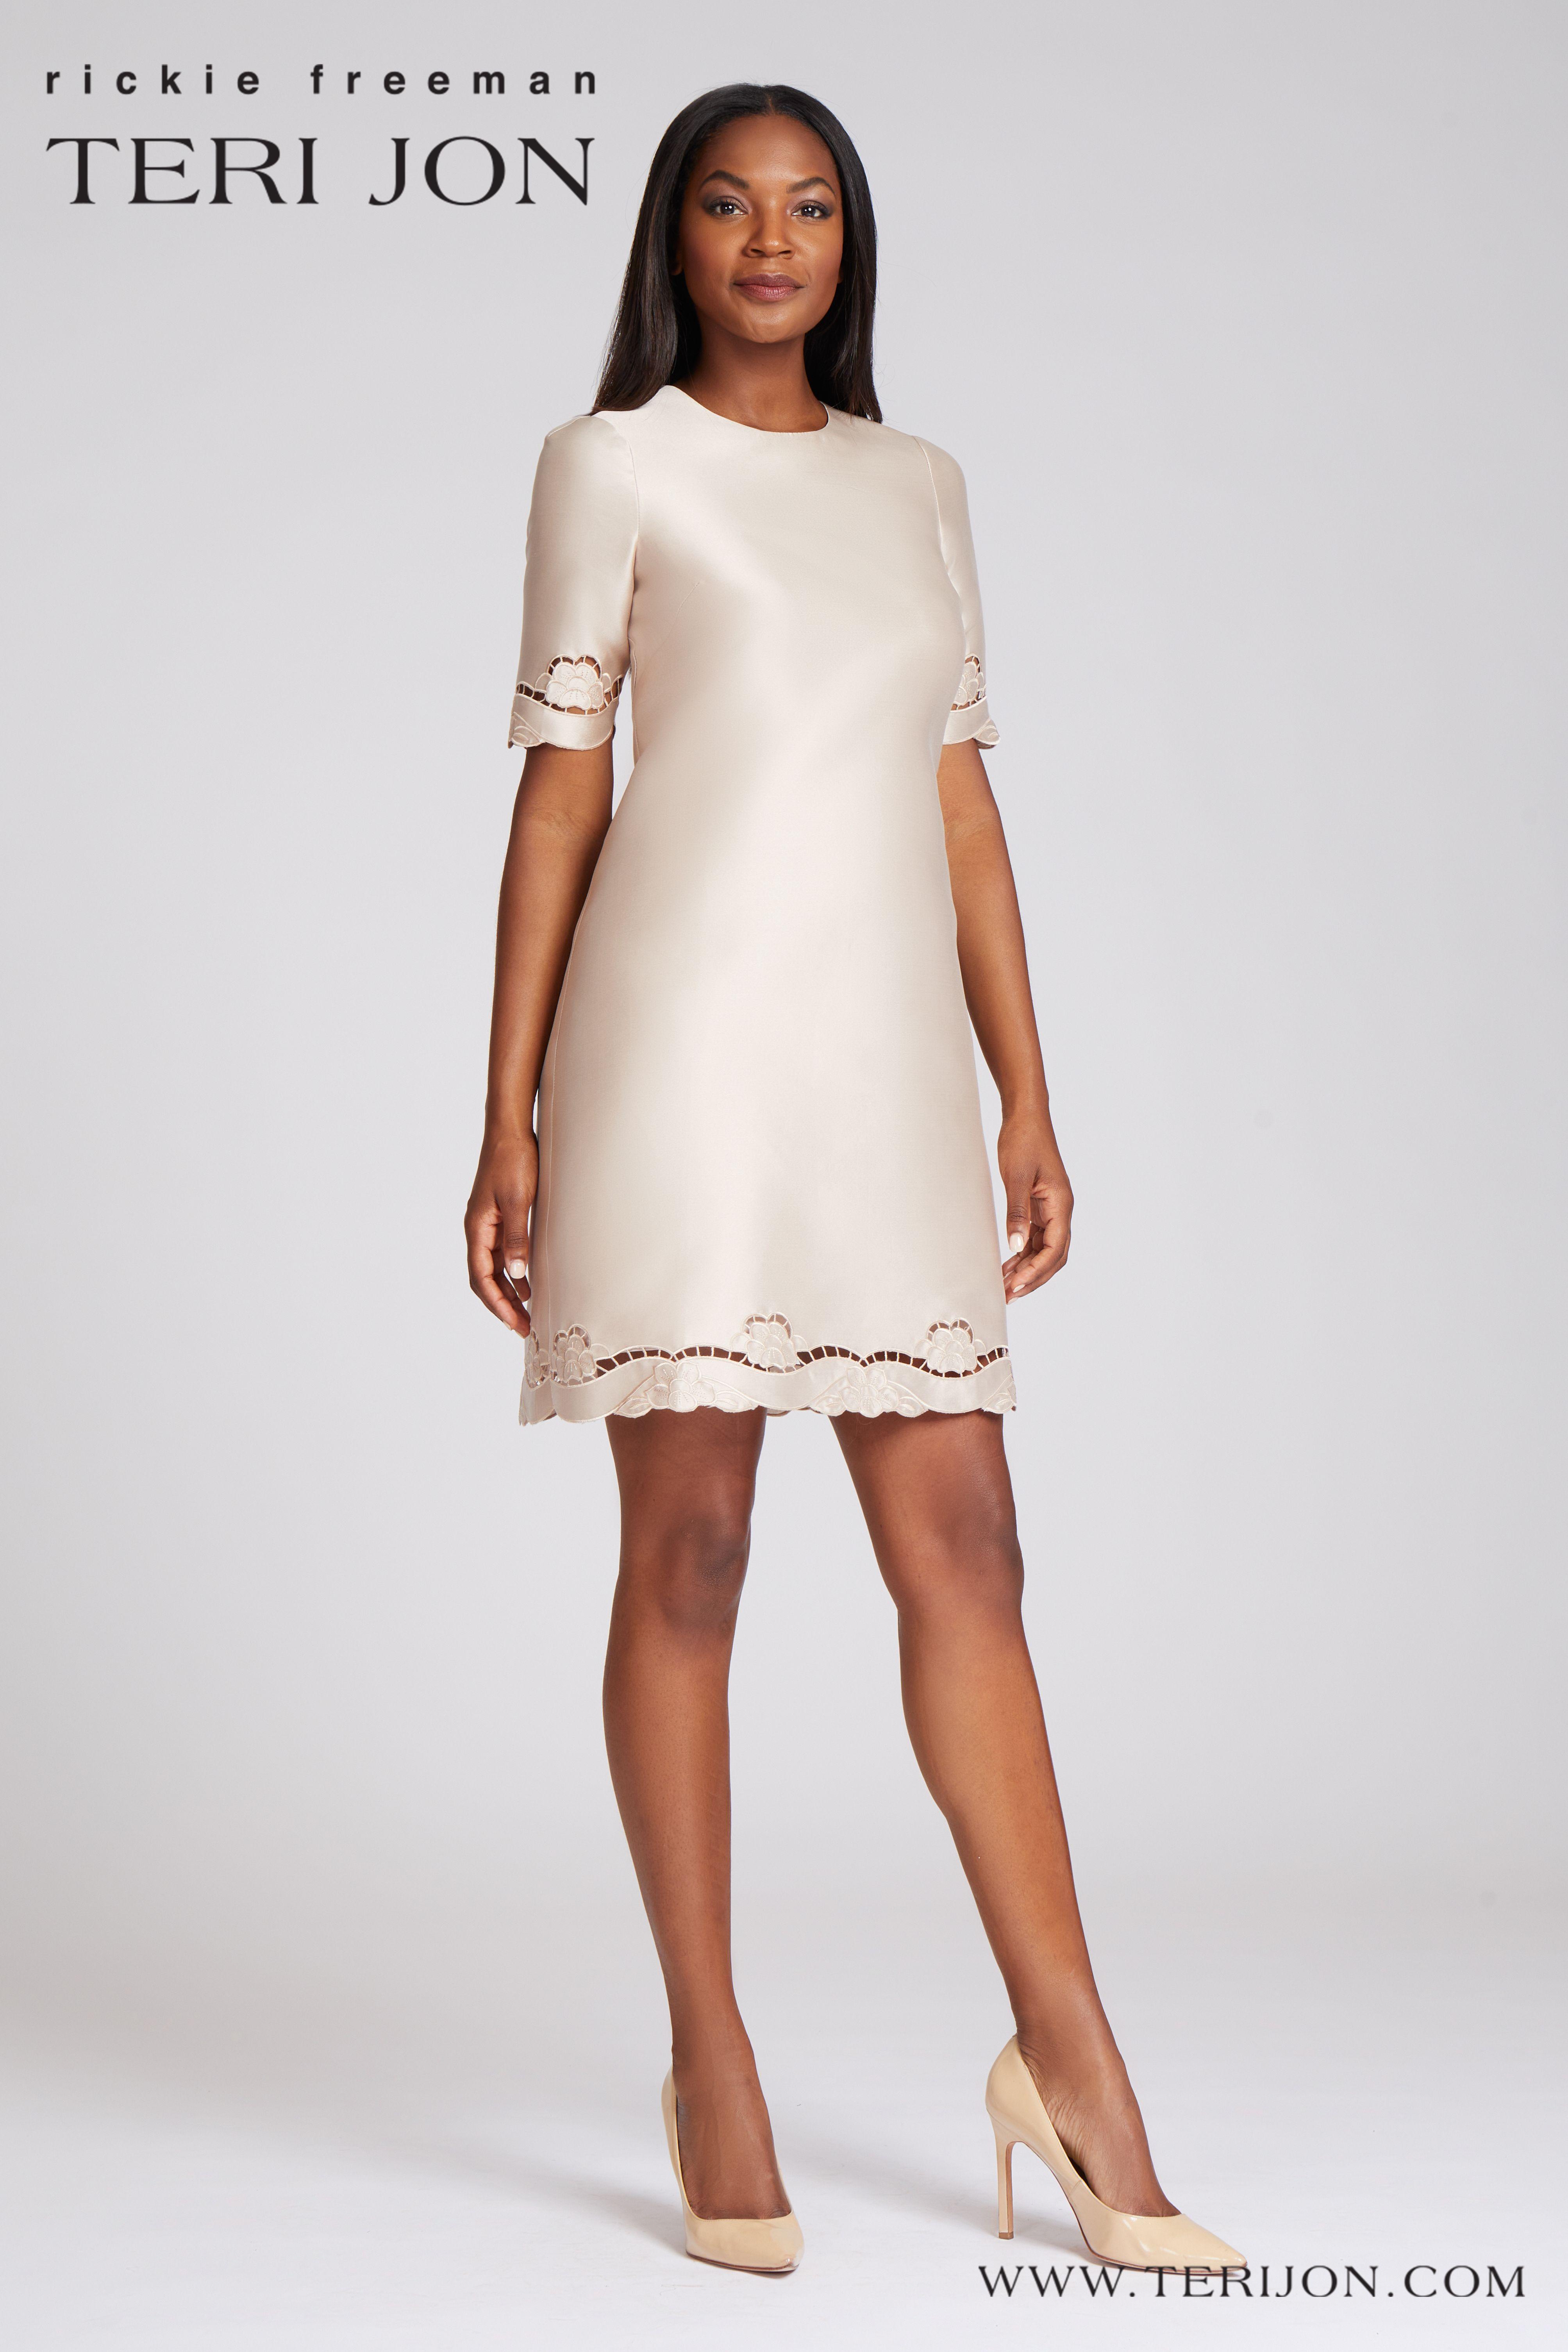 3 4 Sleeves Cocktail Dress In 2021 Dresses Elegant Cocktail Dress Ruffle Sheath Dress [ 6021 x 4014 Pixel ]